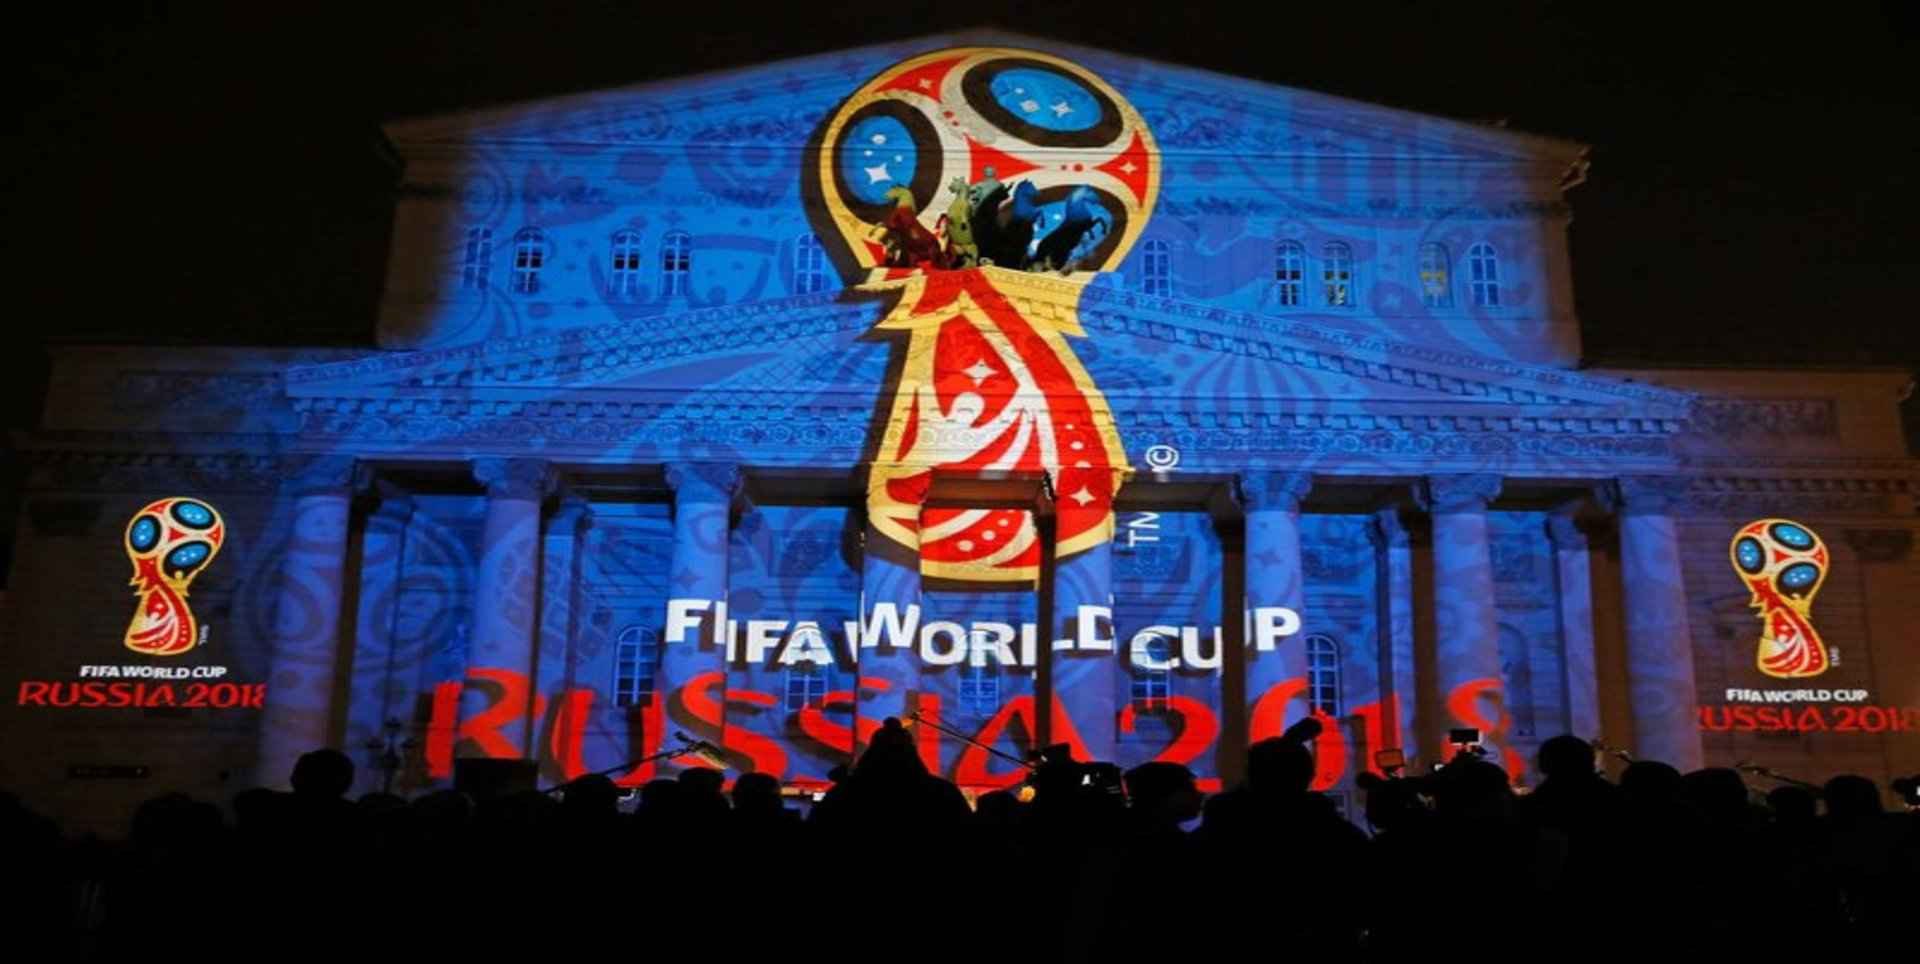 FIFA WC Czech Republic V San Marino Live